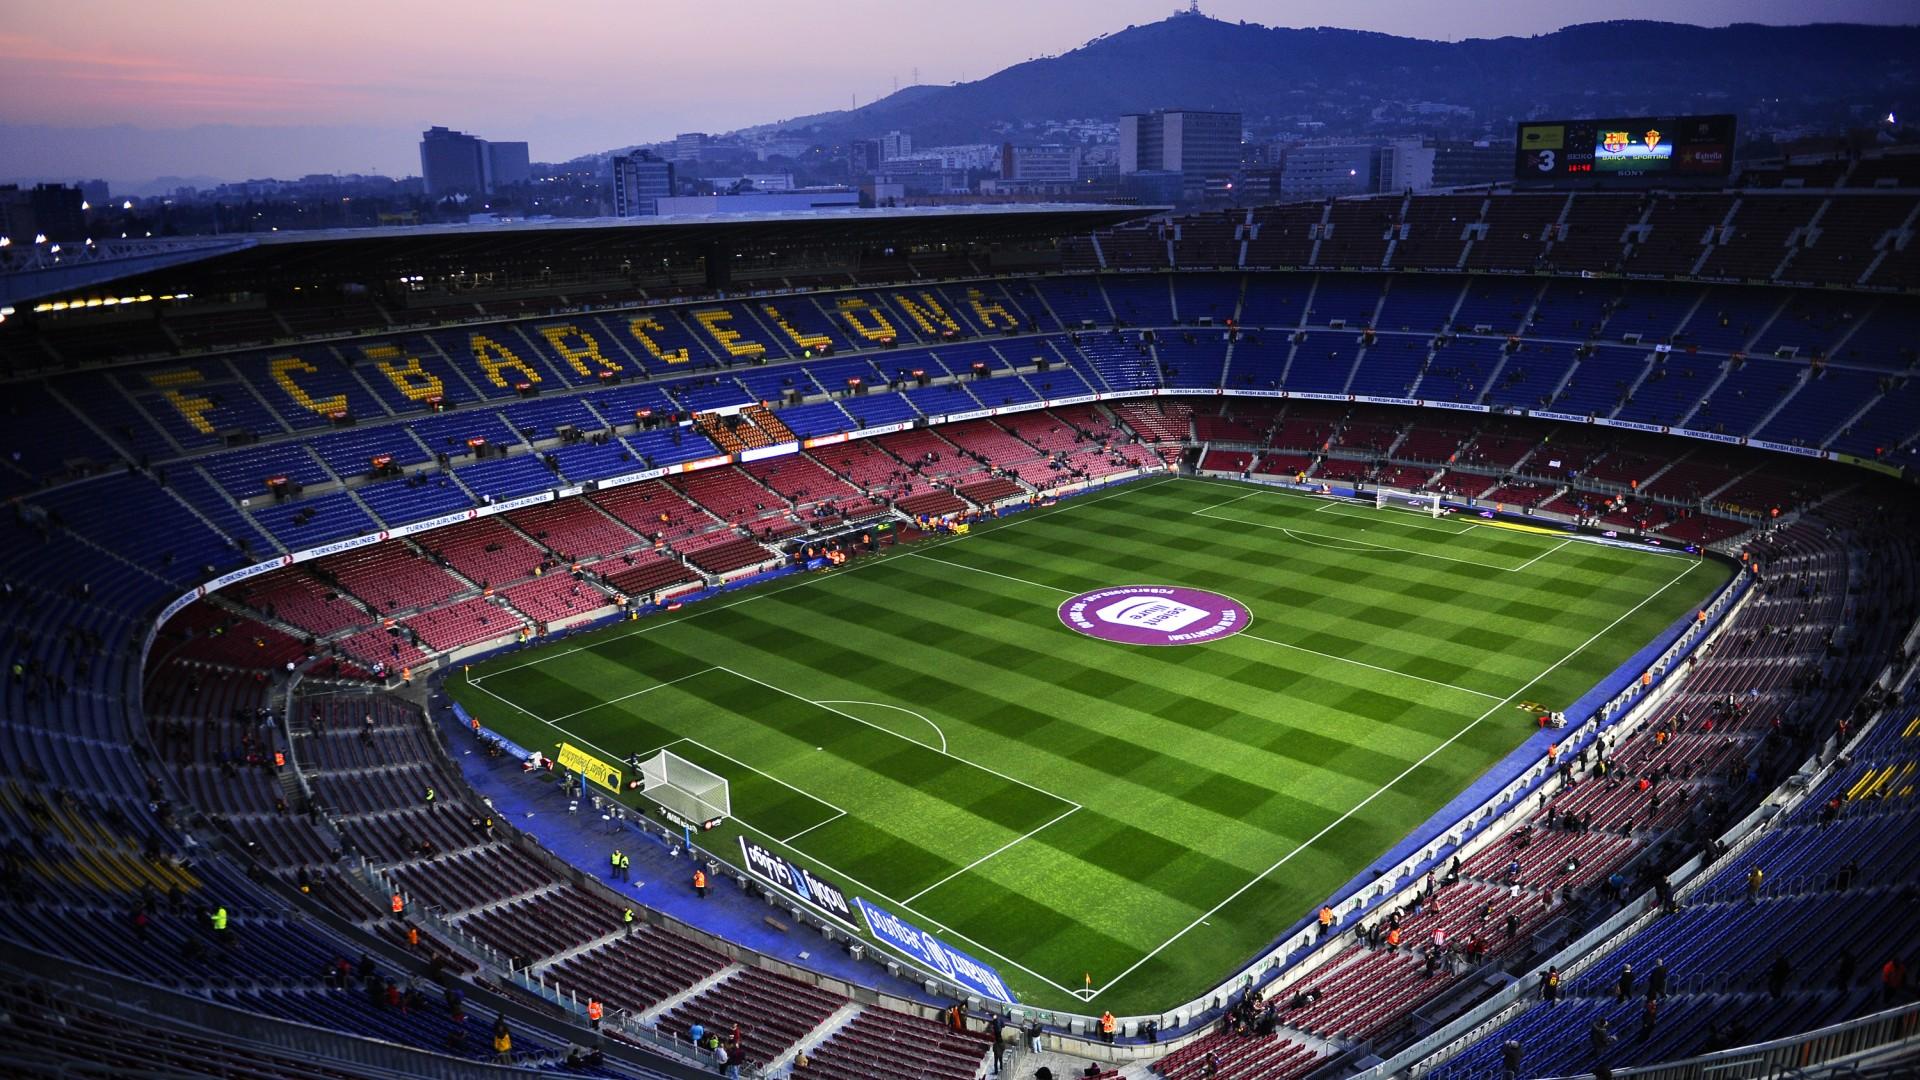 Fonds dcran Camp Nou tous les wallpapers Camp Nou 1920x1080